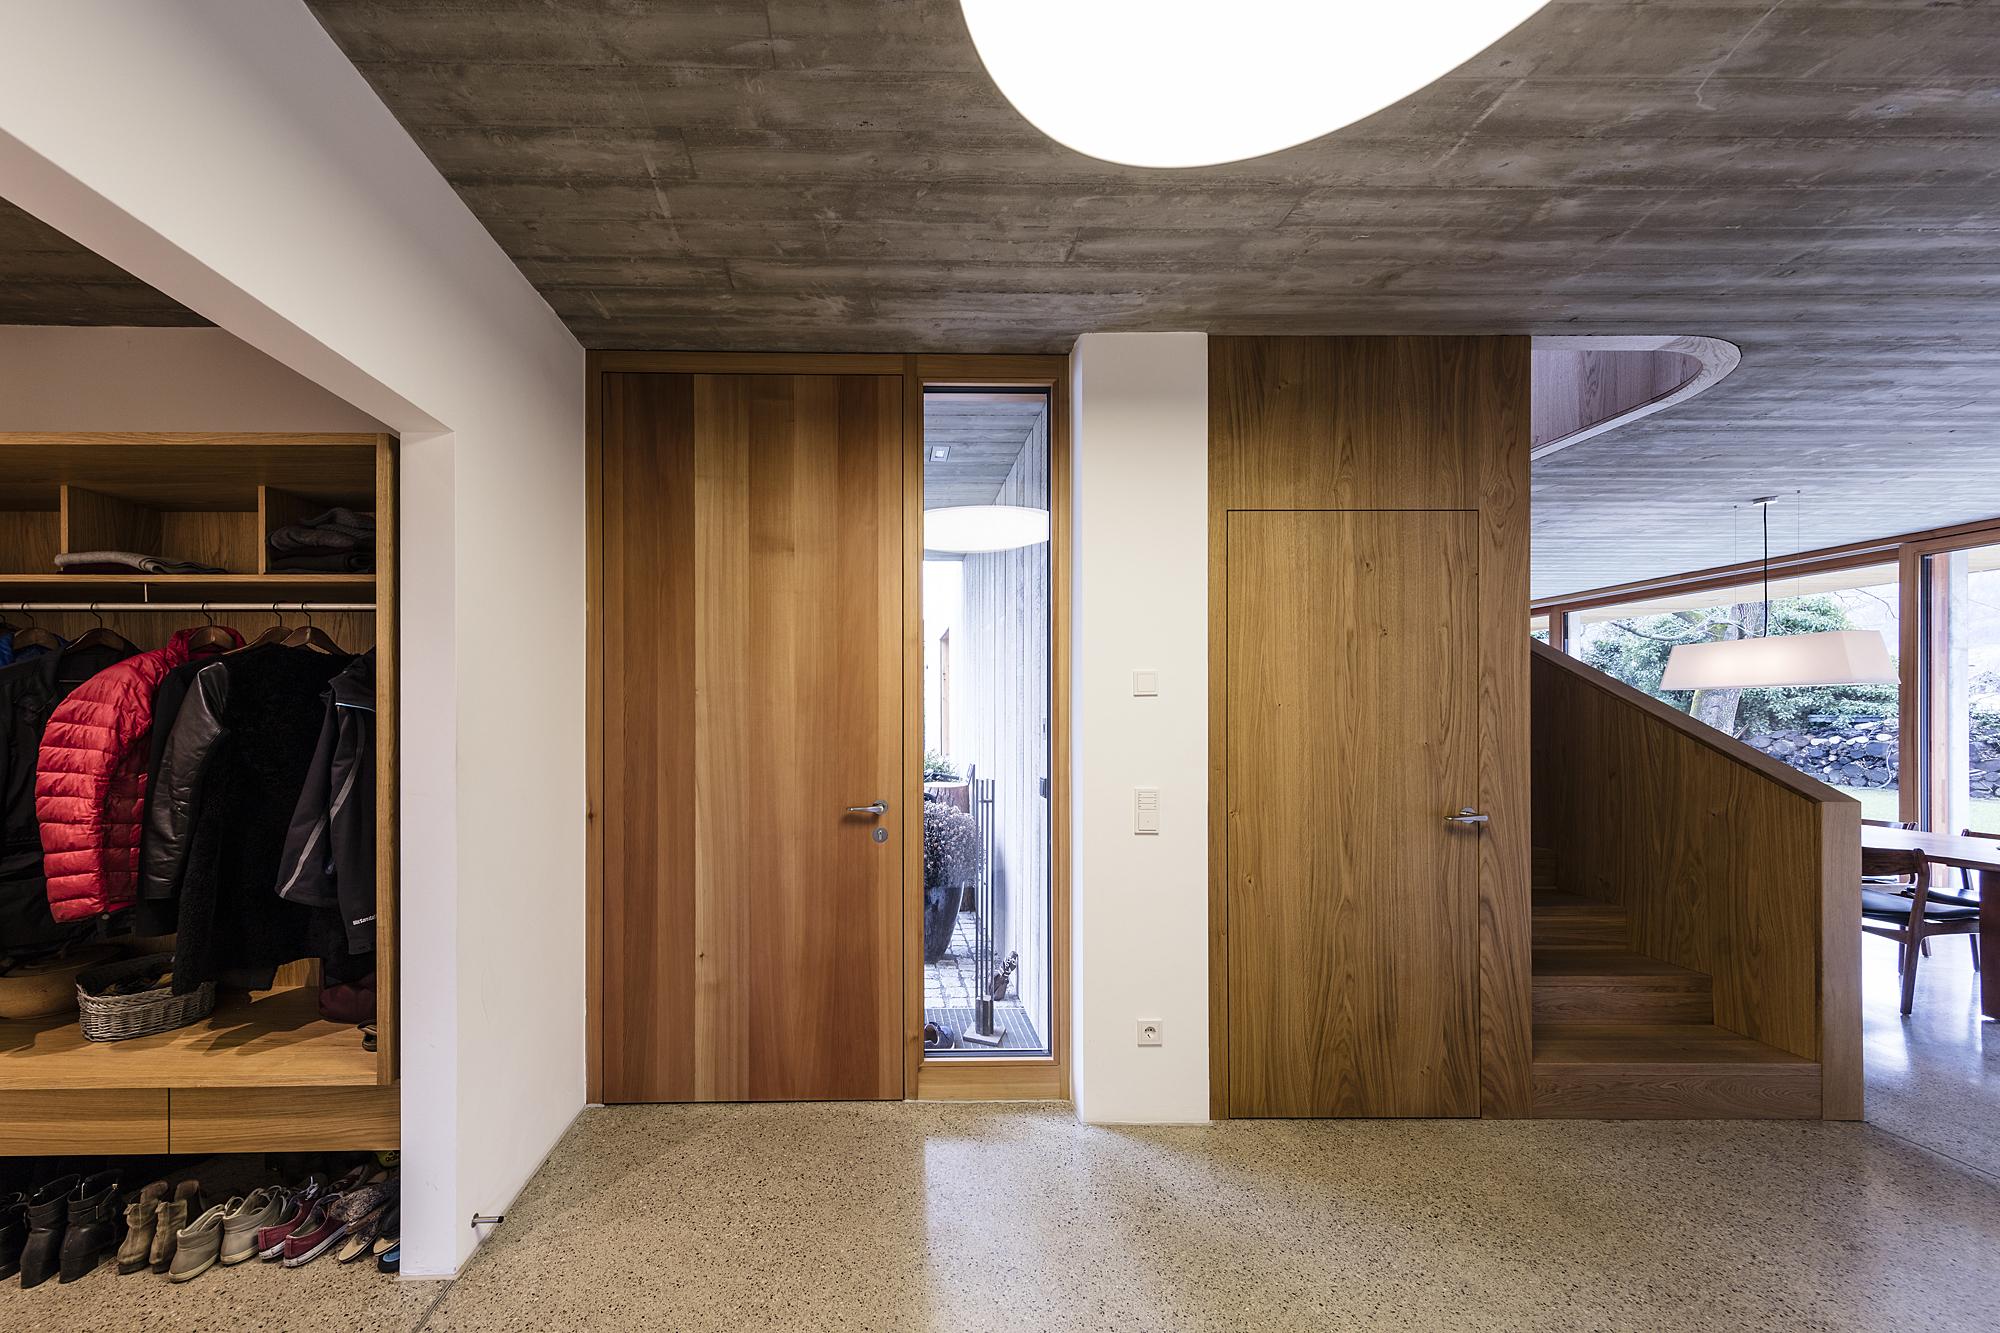 Privathaus_©marschall_8572